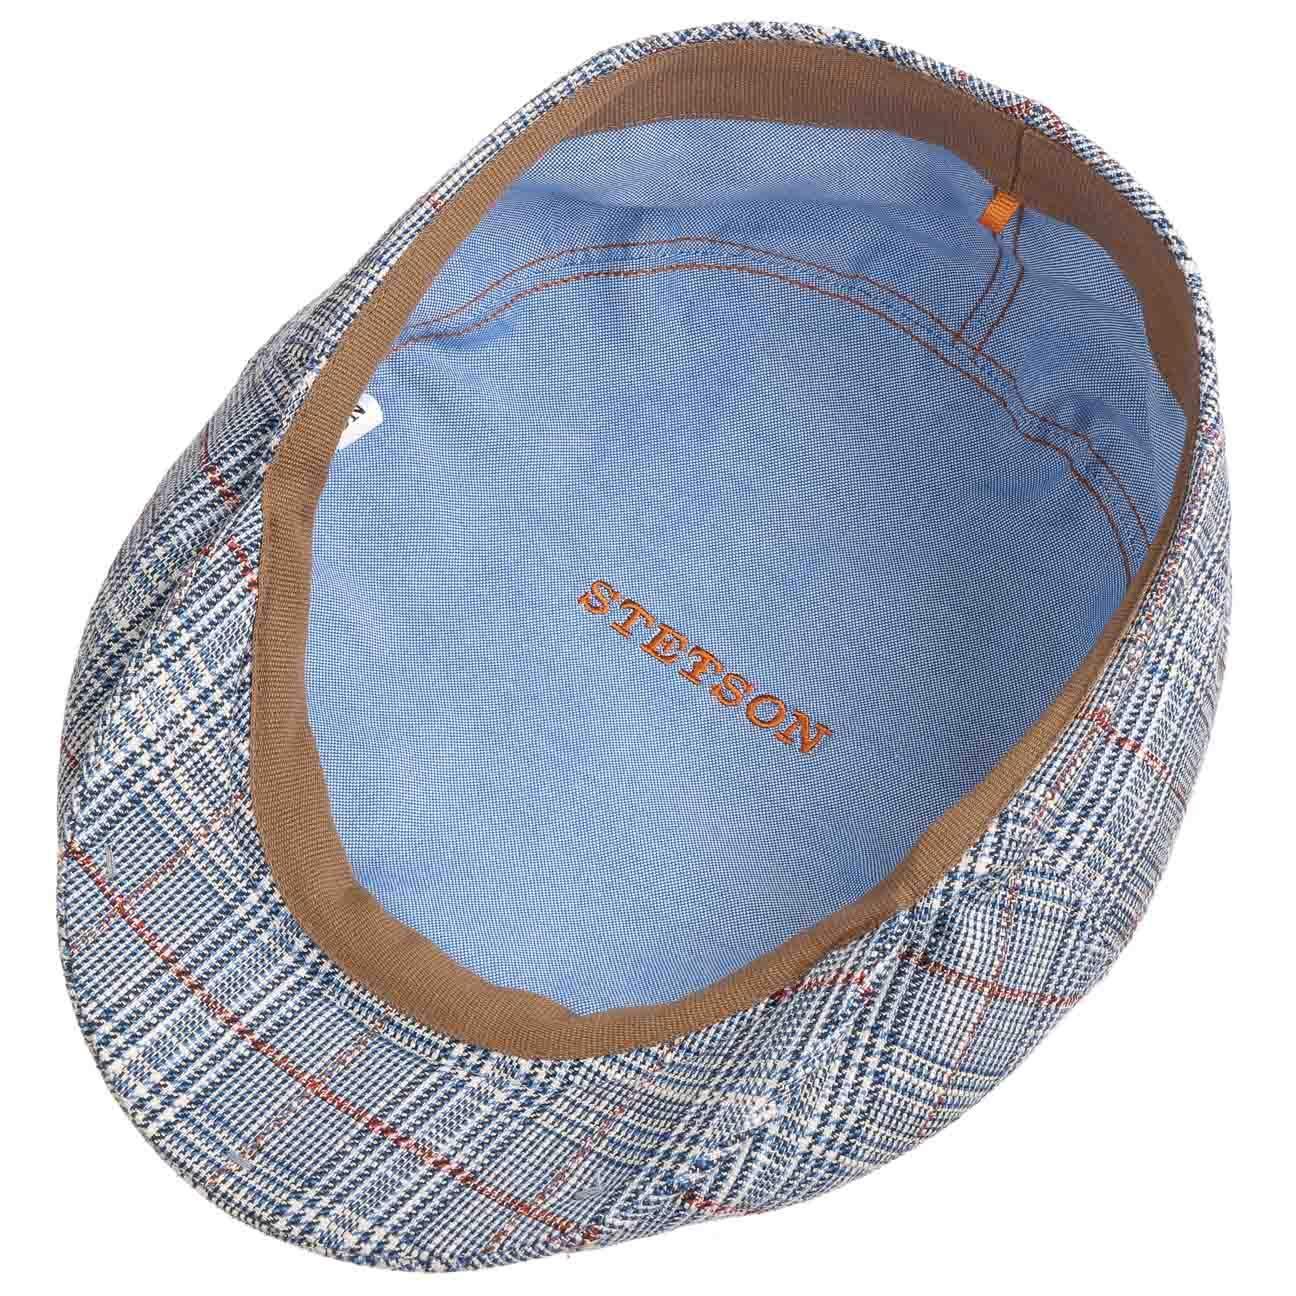 Made in The EU mit Schirm Futter Futter Stetson Bedford Cotton Linen Check Flatcap Schirmm/ütze Baumwollcap Leinencap Schieberm/ütze Herren